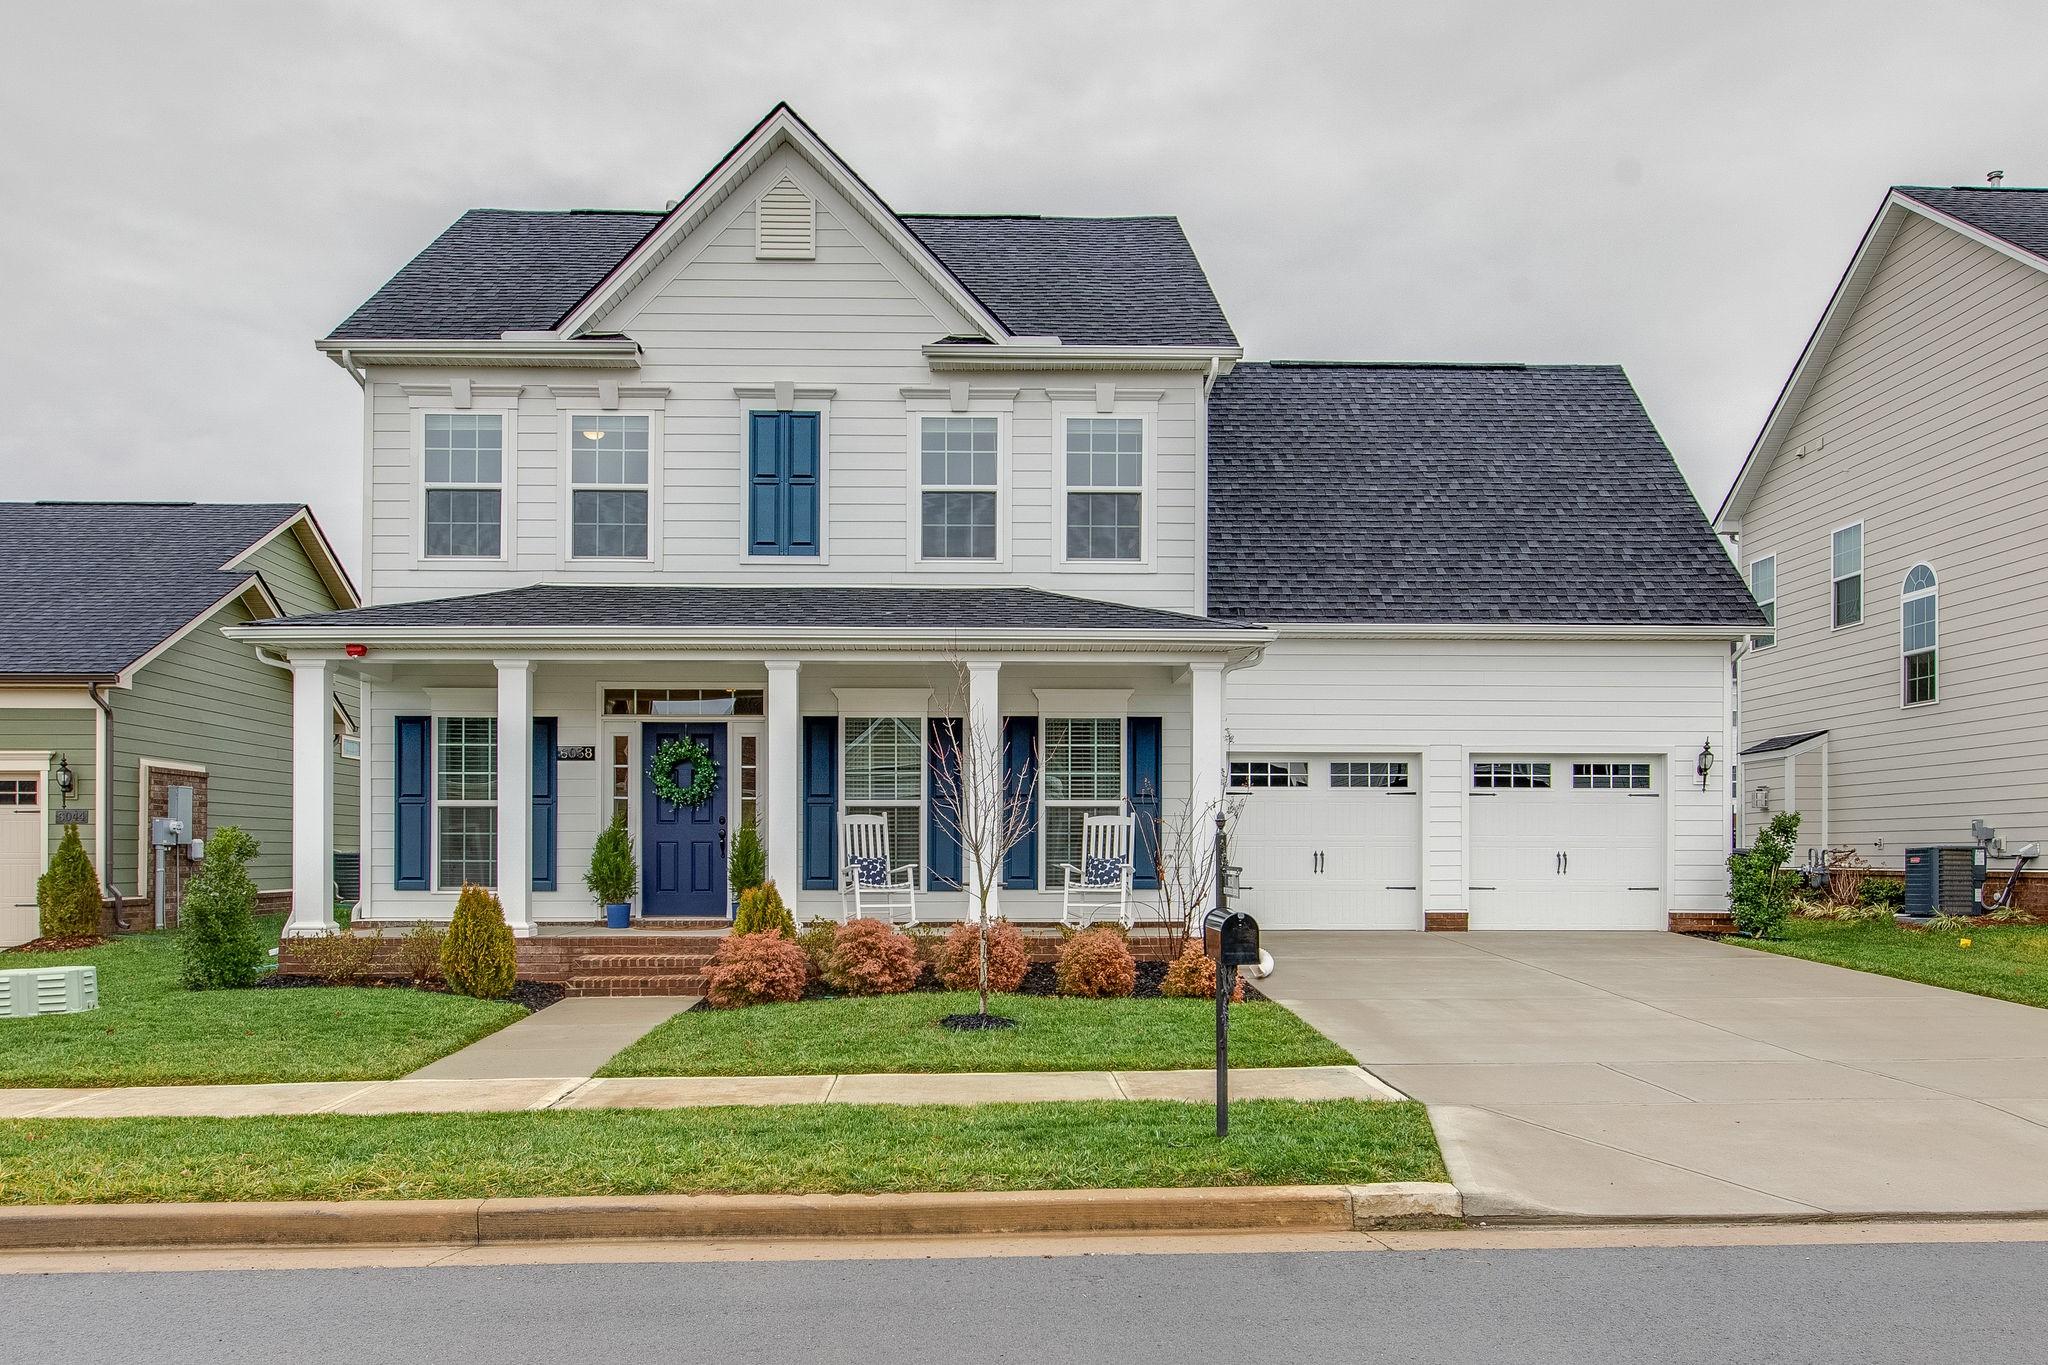 6038 Huntmere Ave, Franklin, TN 37064 - Franklin, TN real estate listing